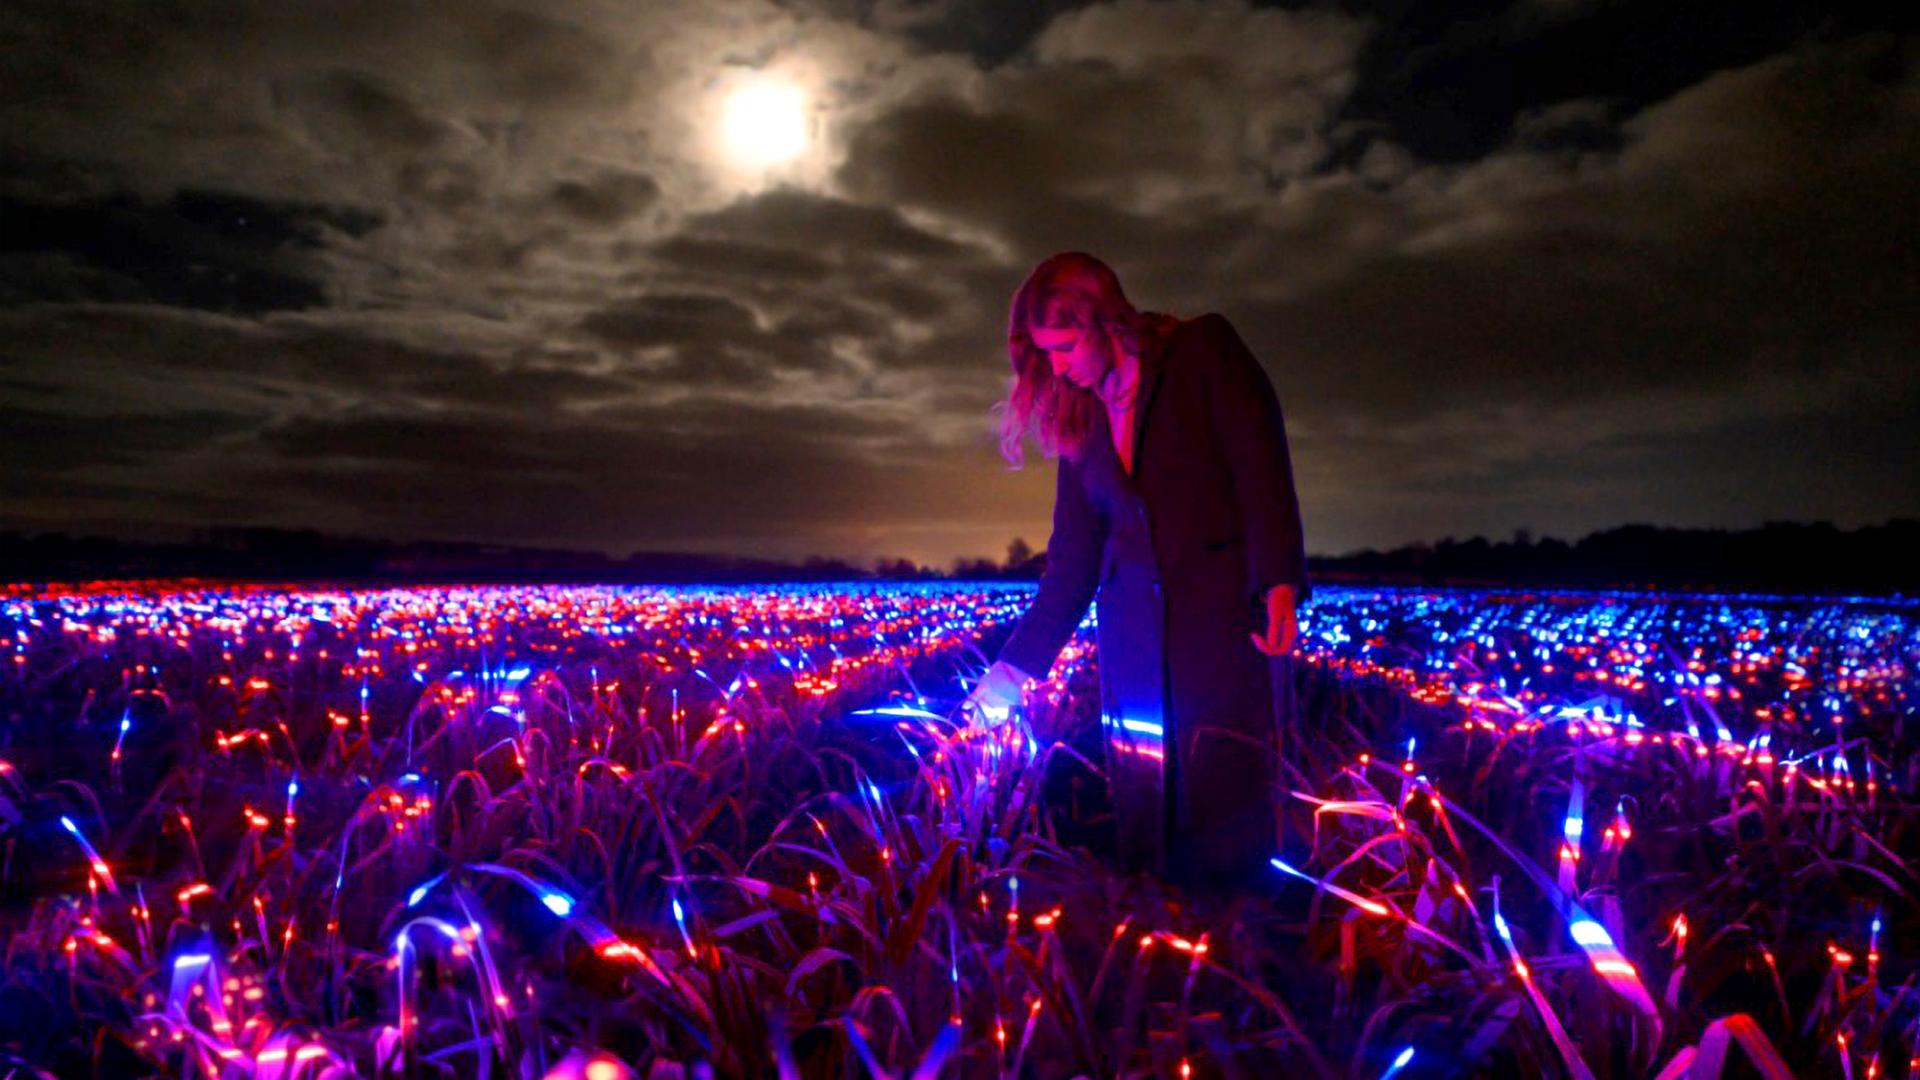 Dutch Creator Turns Leek Field Into Light Show Spectacular